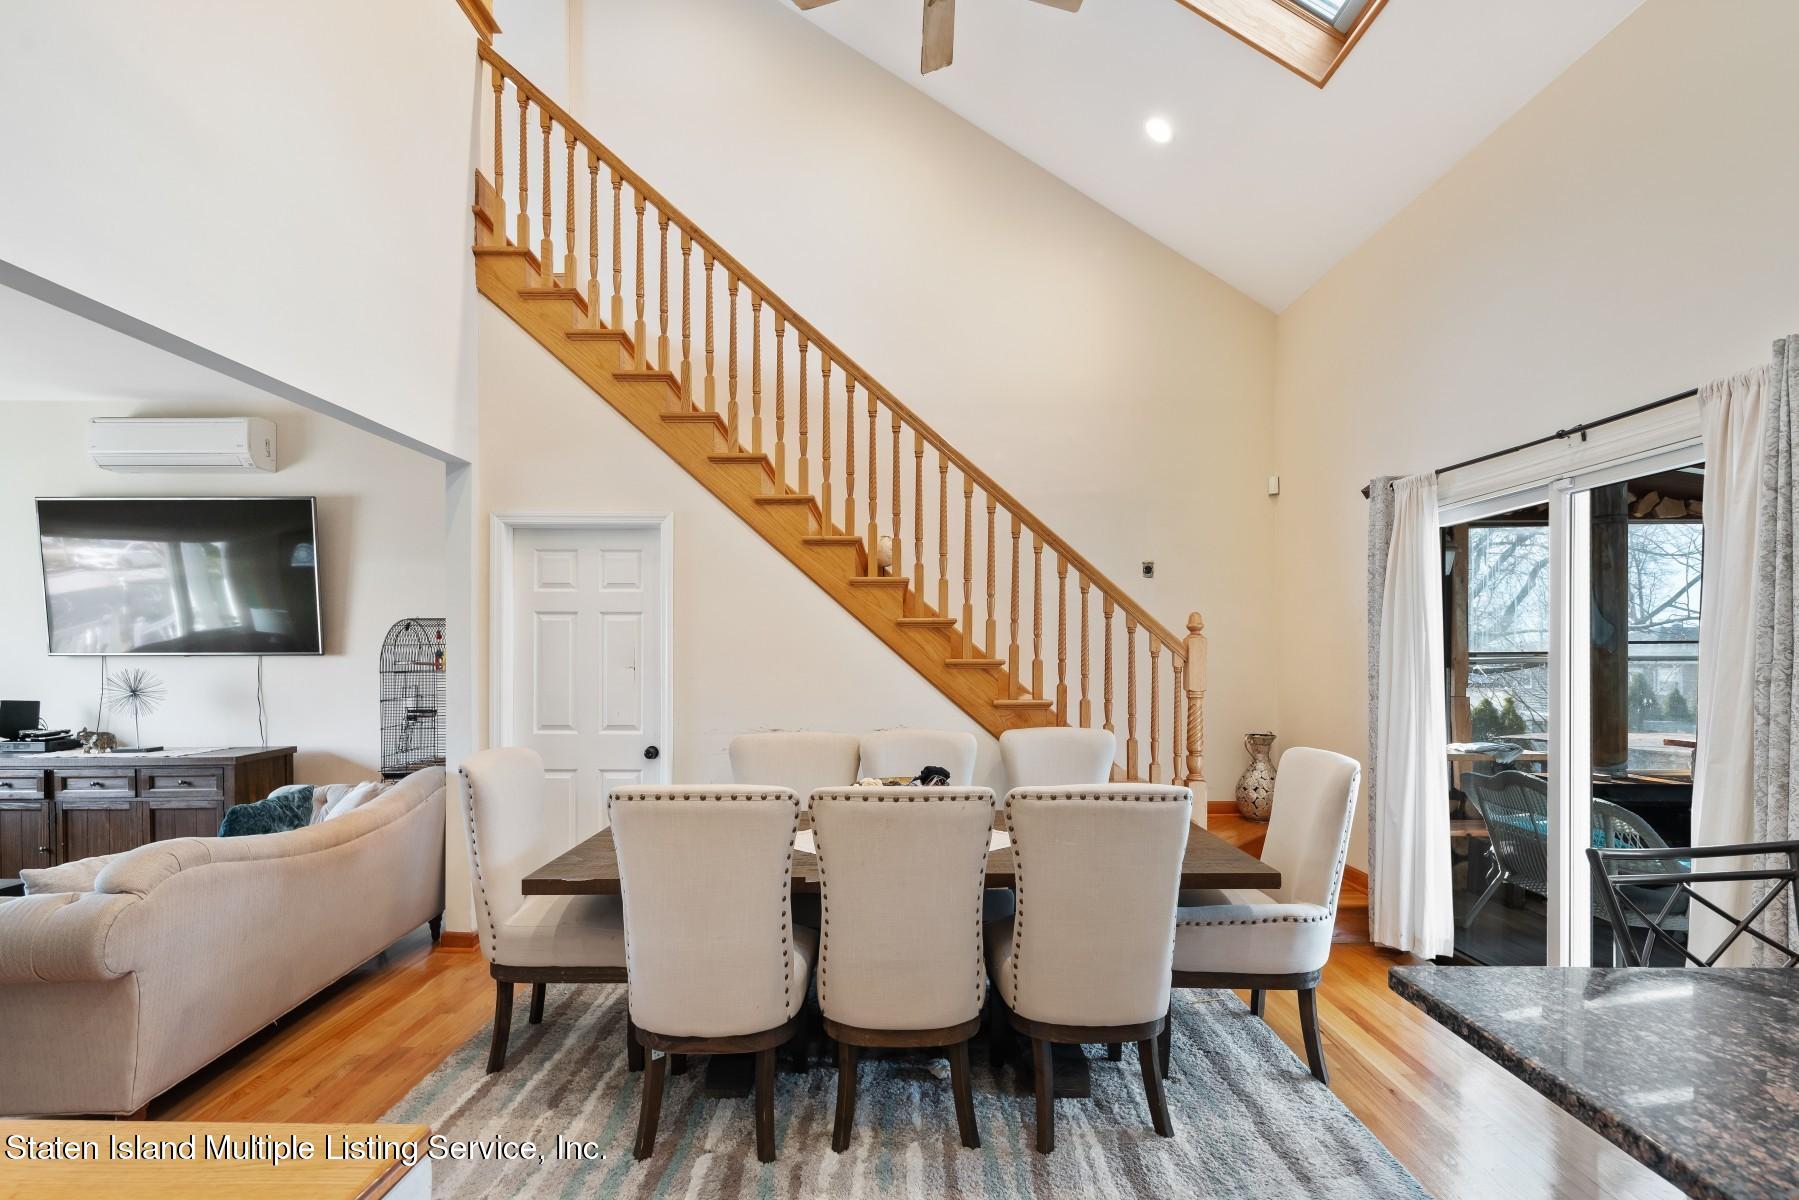 Single Family - Detached 8 Bionia Avenue  Staten Island, NY 10305, MLS-1142818-6